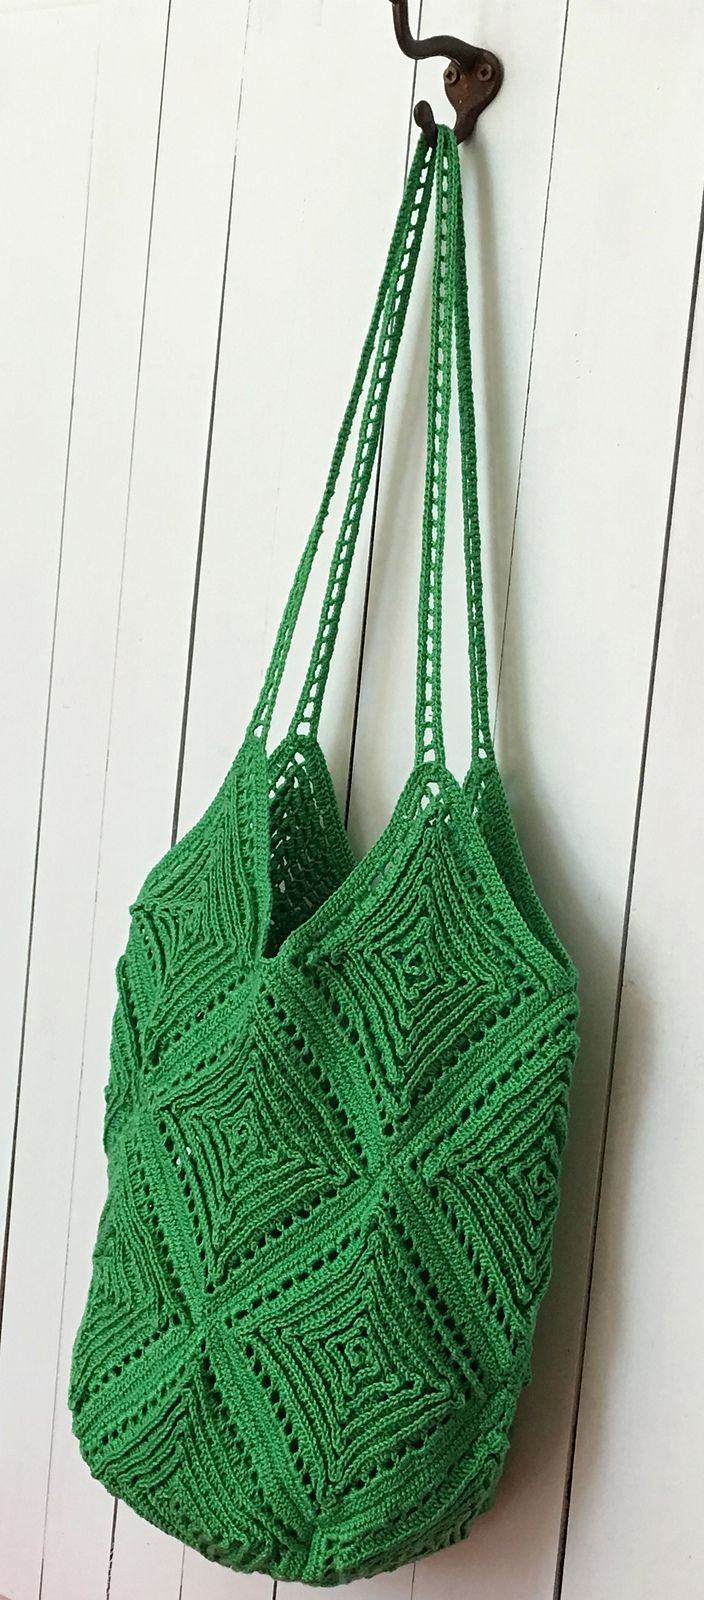 Crochet pattern for a lovely-textured tote bag / handbag / purse.